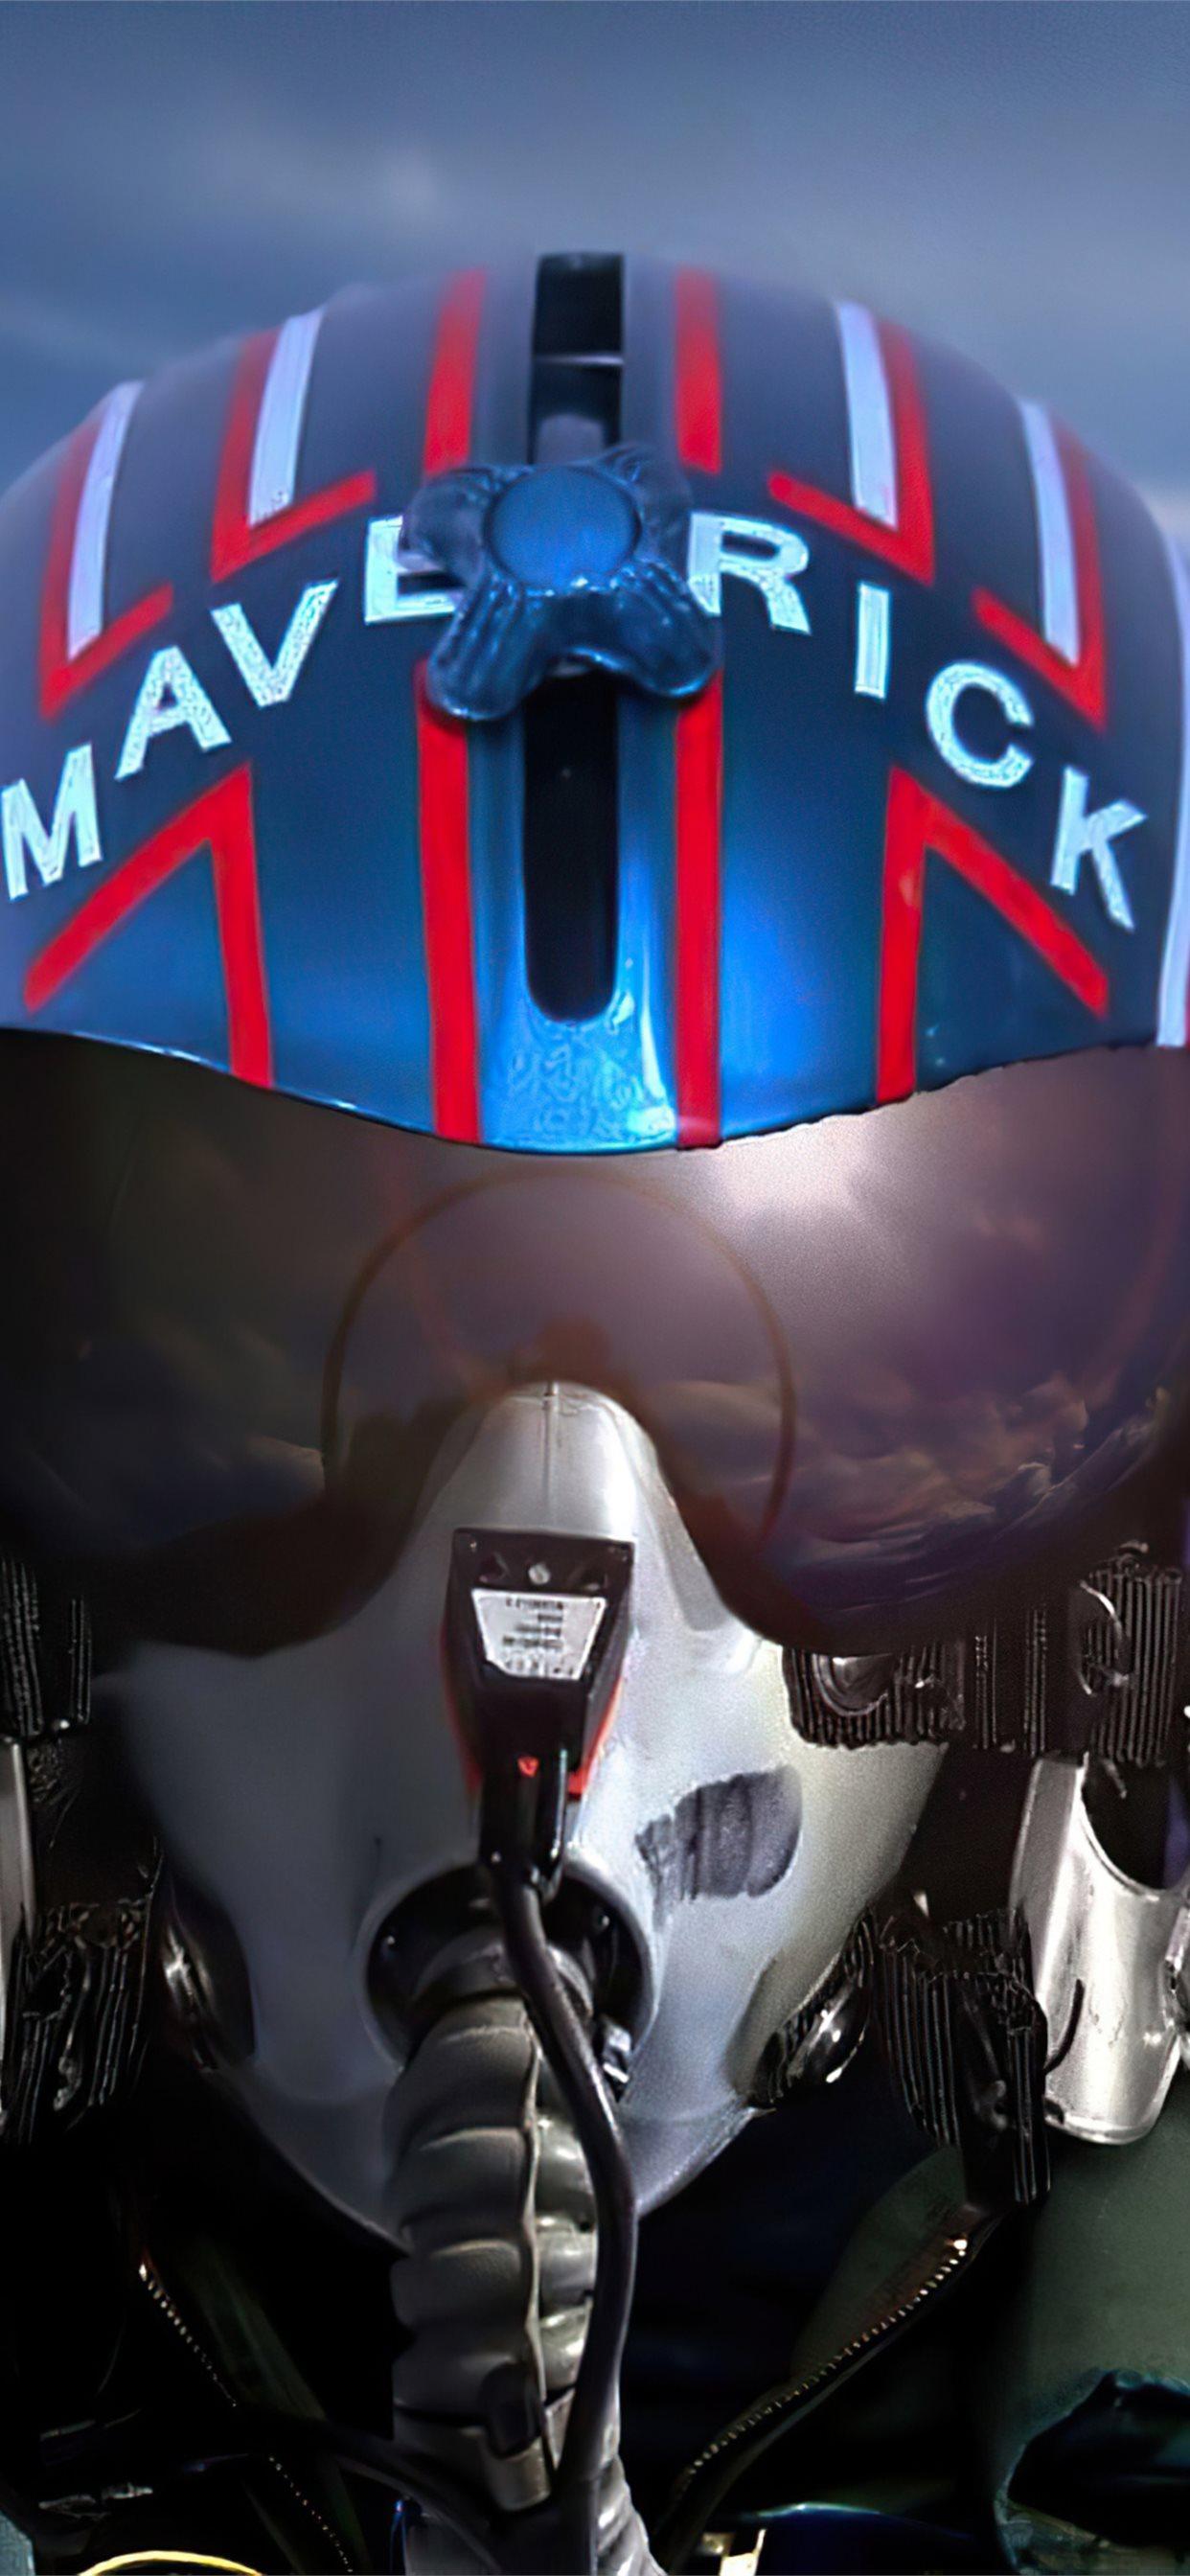 Top Gun Maverick Tom Cruise 4k Iphone 11 Wallpapers Free Download